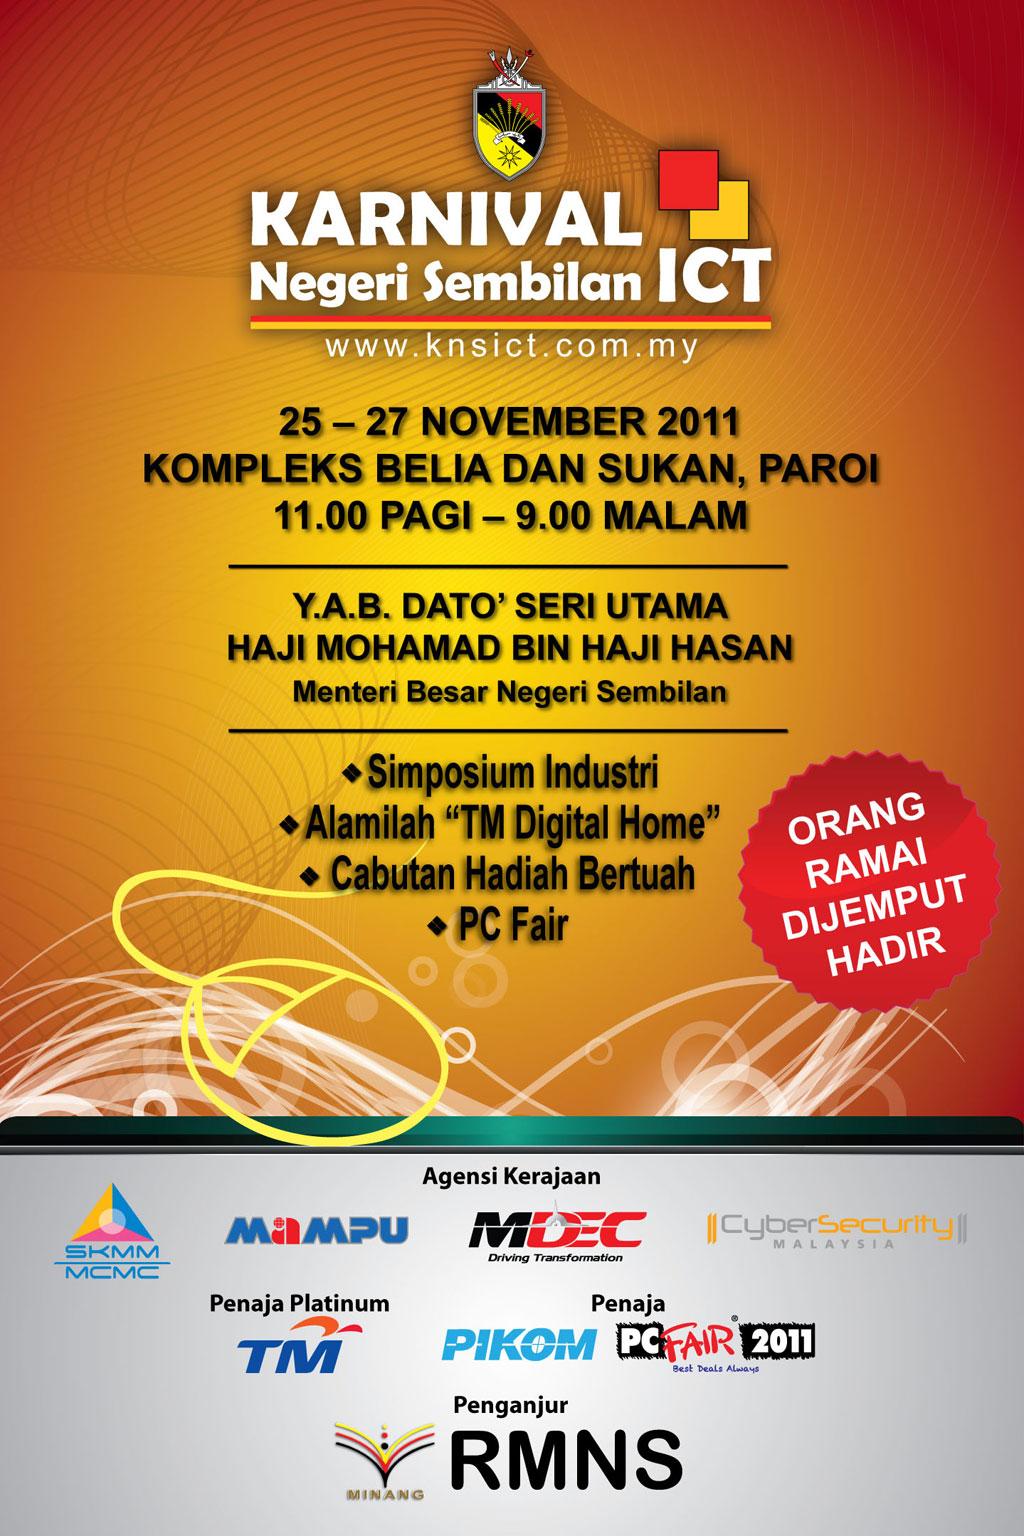 Welcome to Negeri Sembilan ICT Karnival - 2011